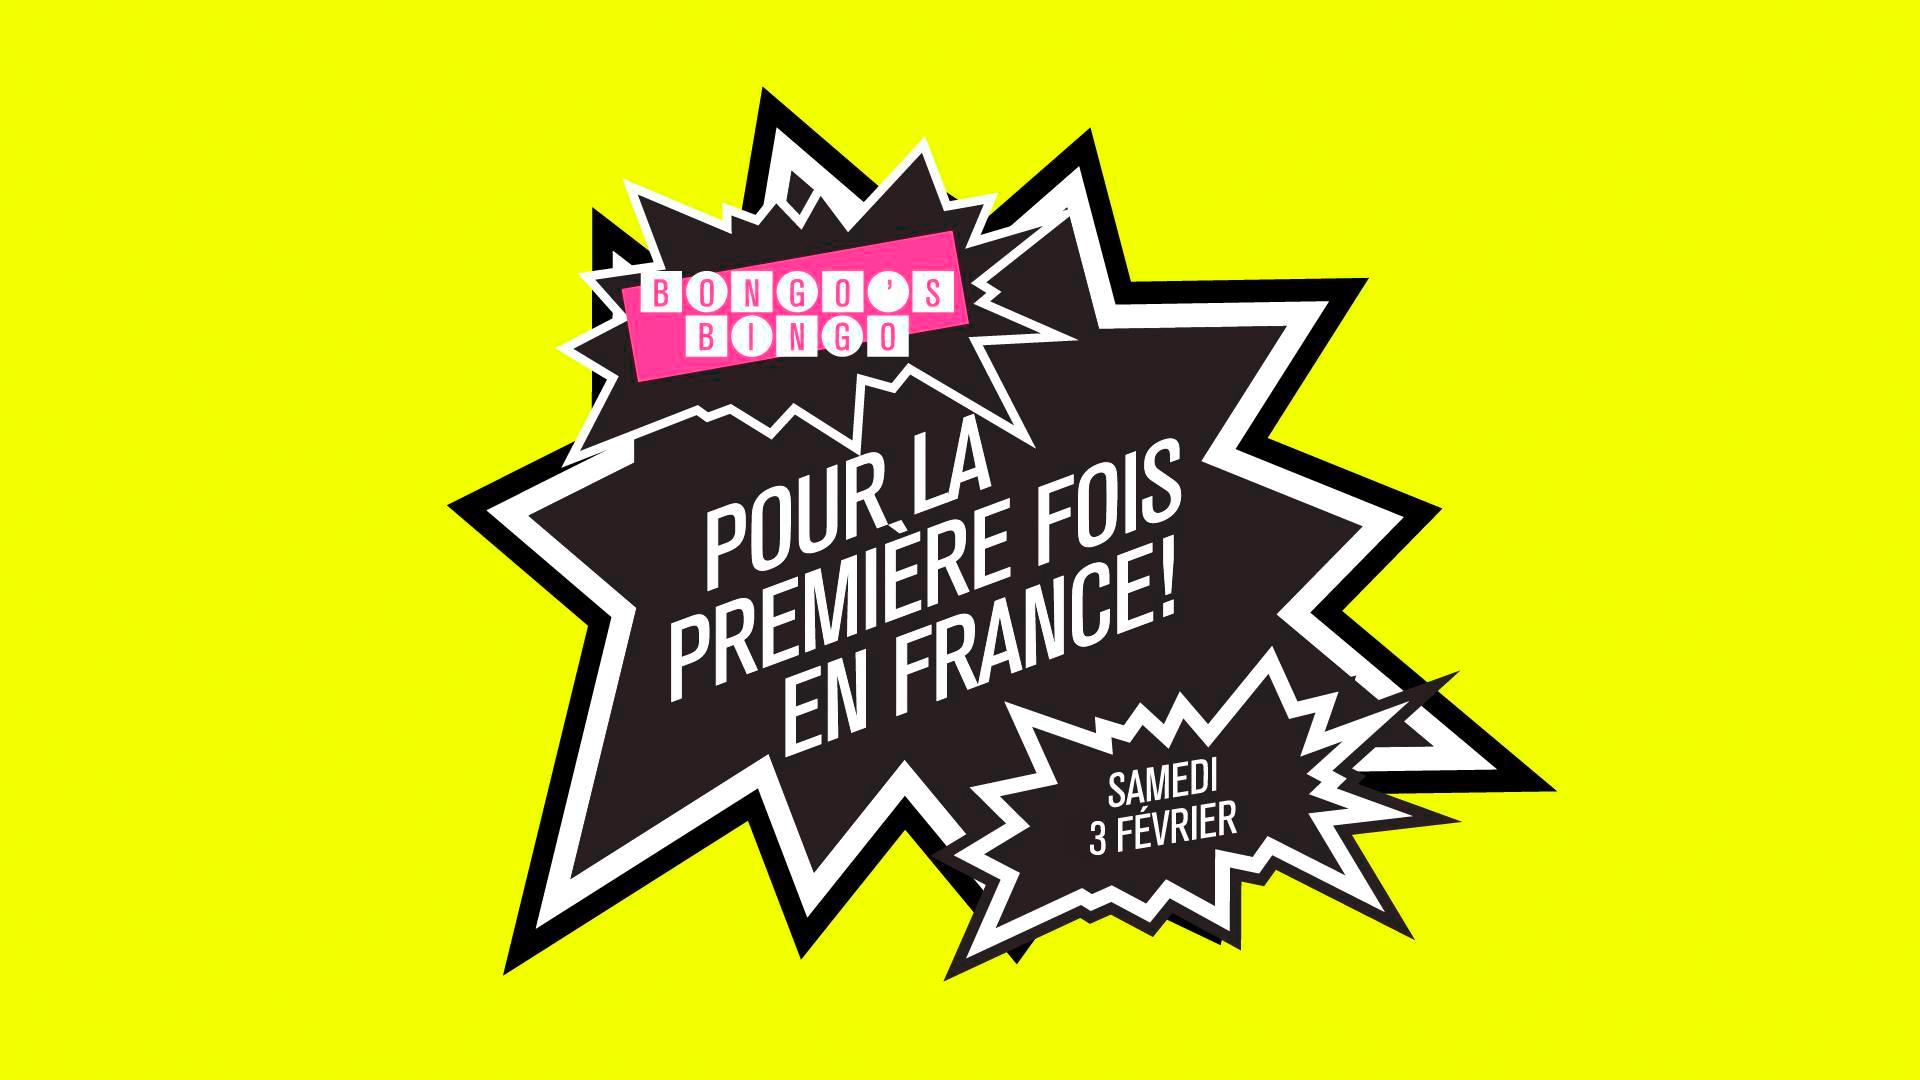 Bongo's Bingo Paris / Samedi 3 Février